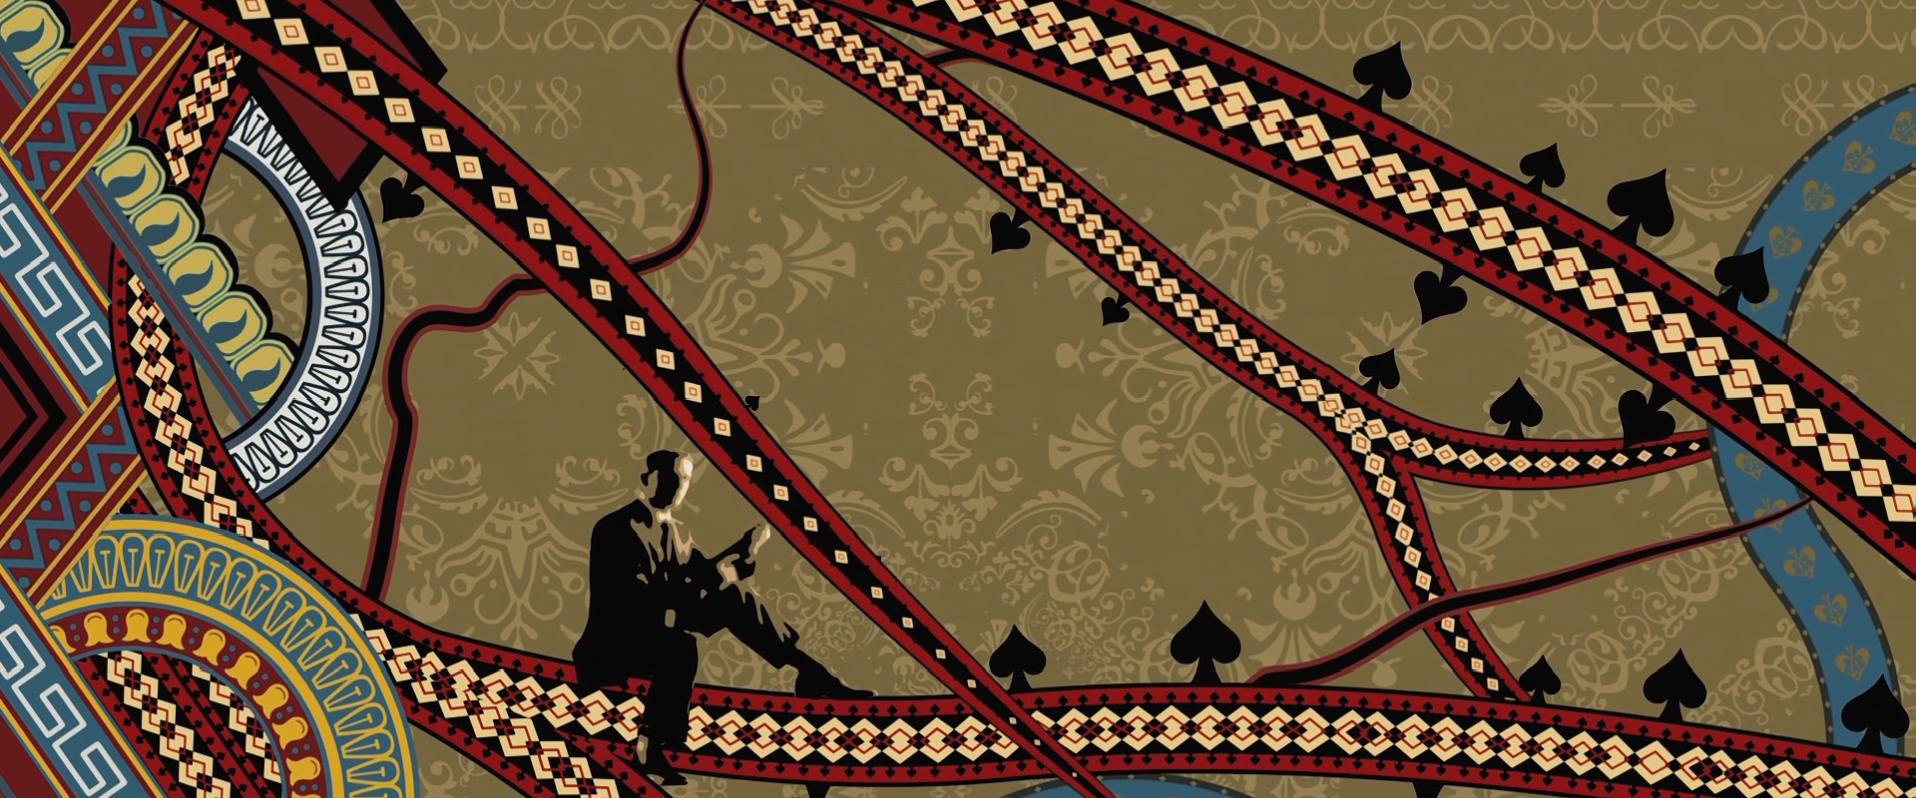 Casino royale main theme betting casino gambling online slot sports